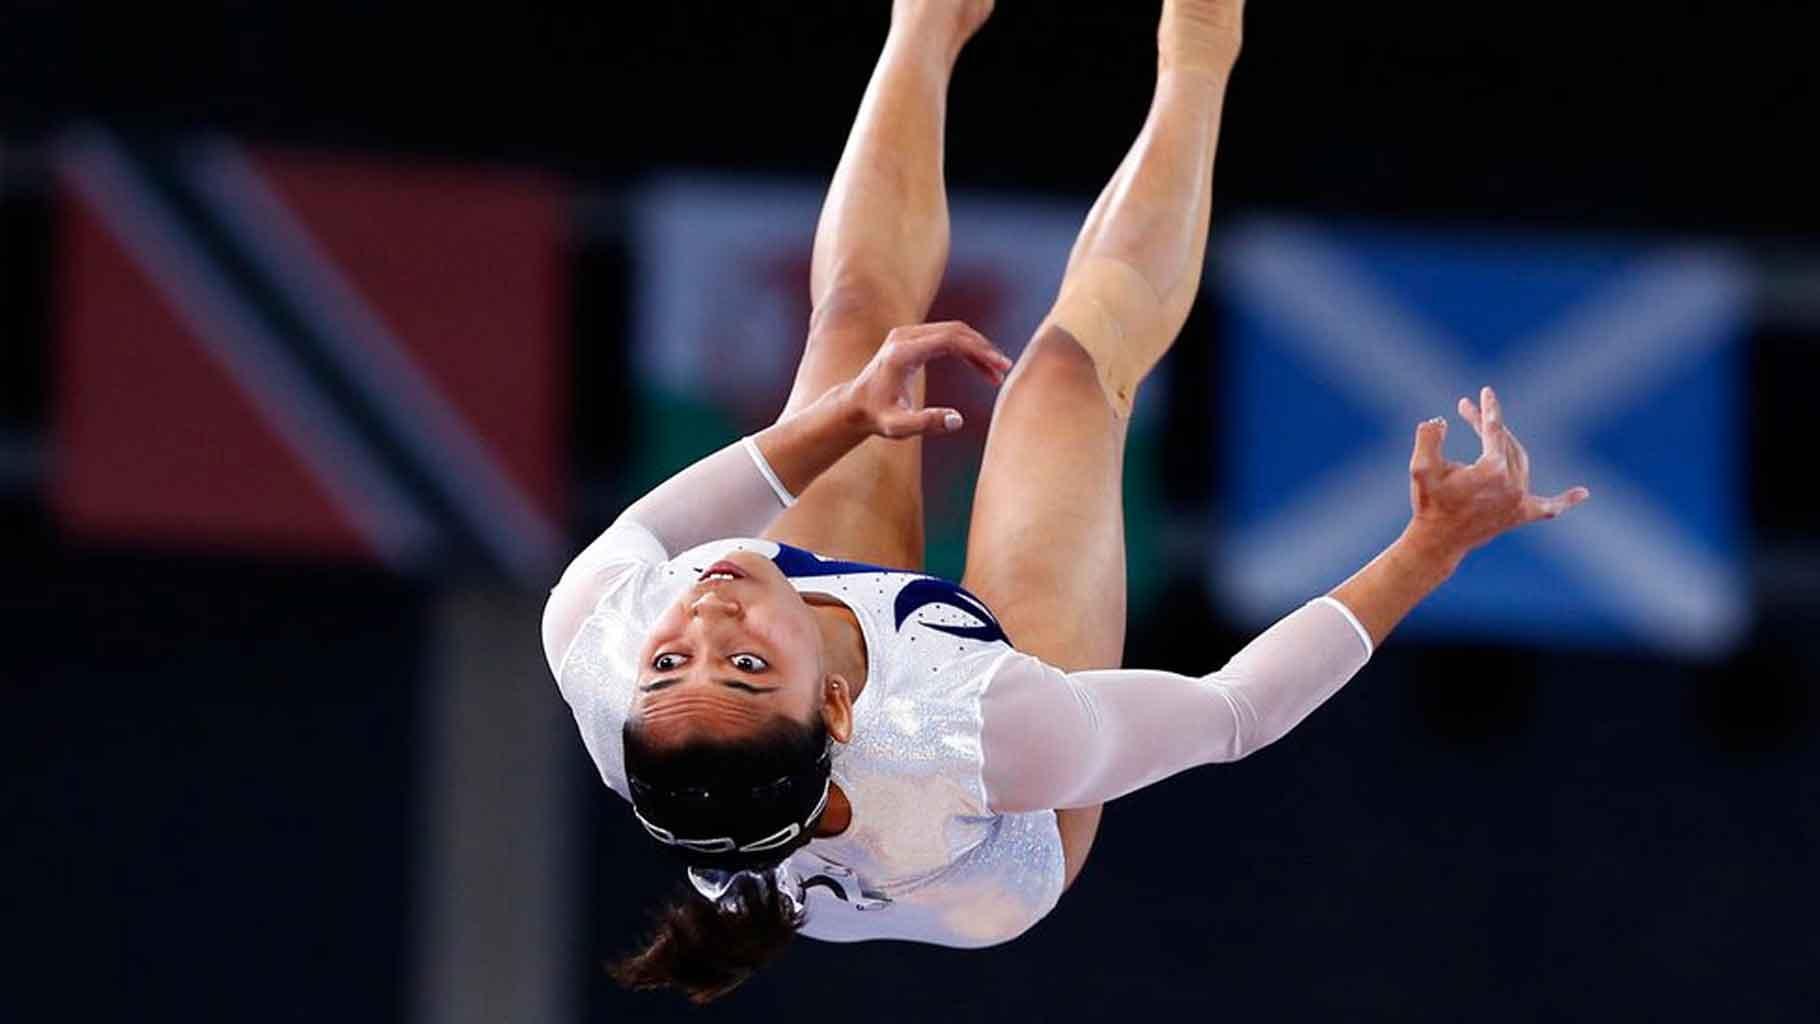 gymnastics global performance testing - HD1820×1024